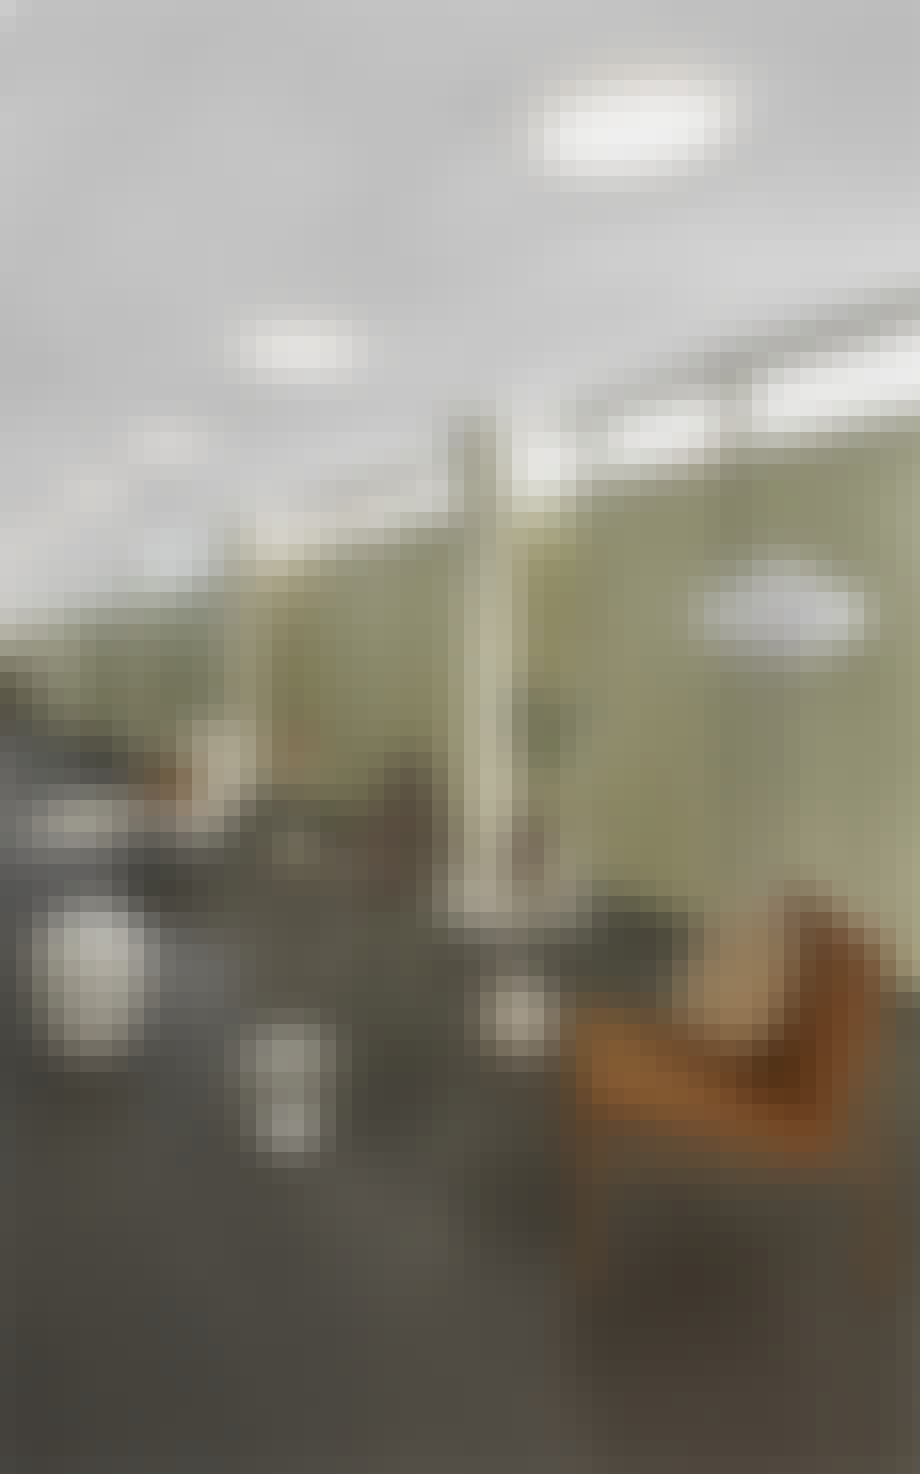 arne jacobsen indretning design stol lampe